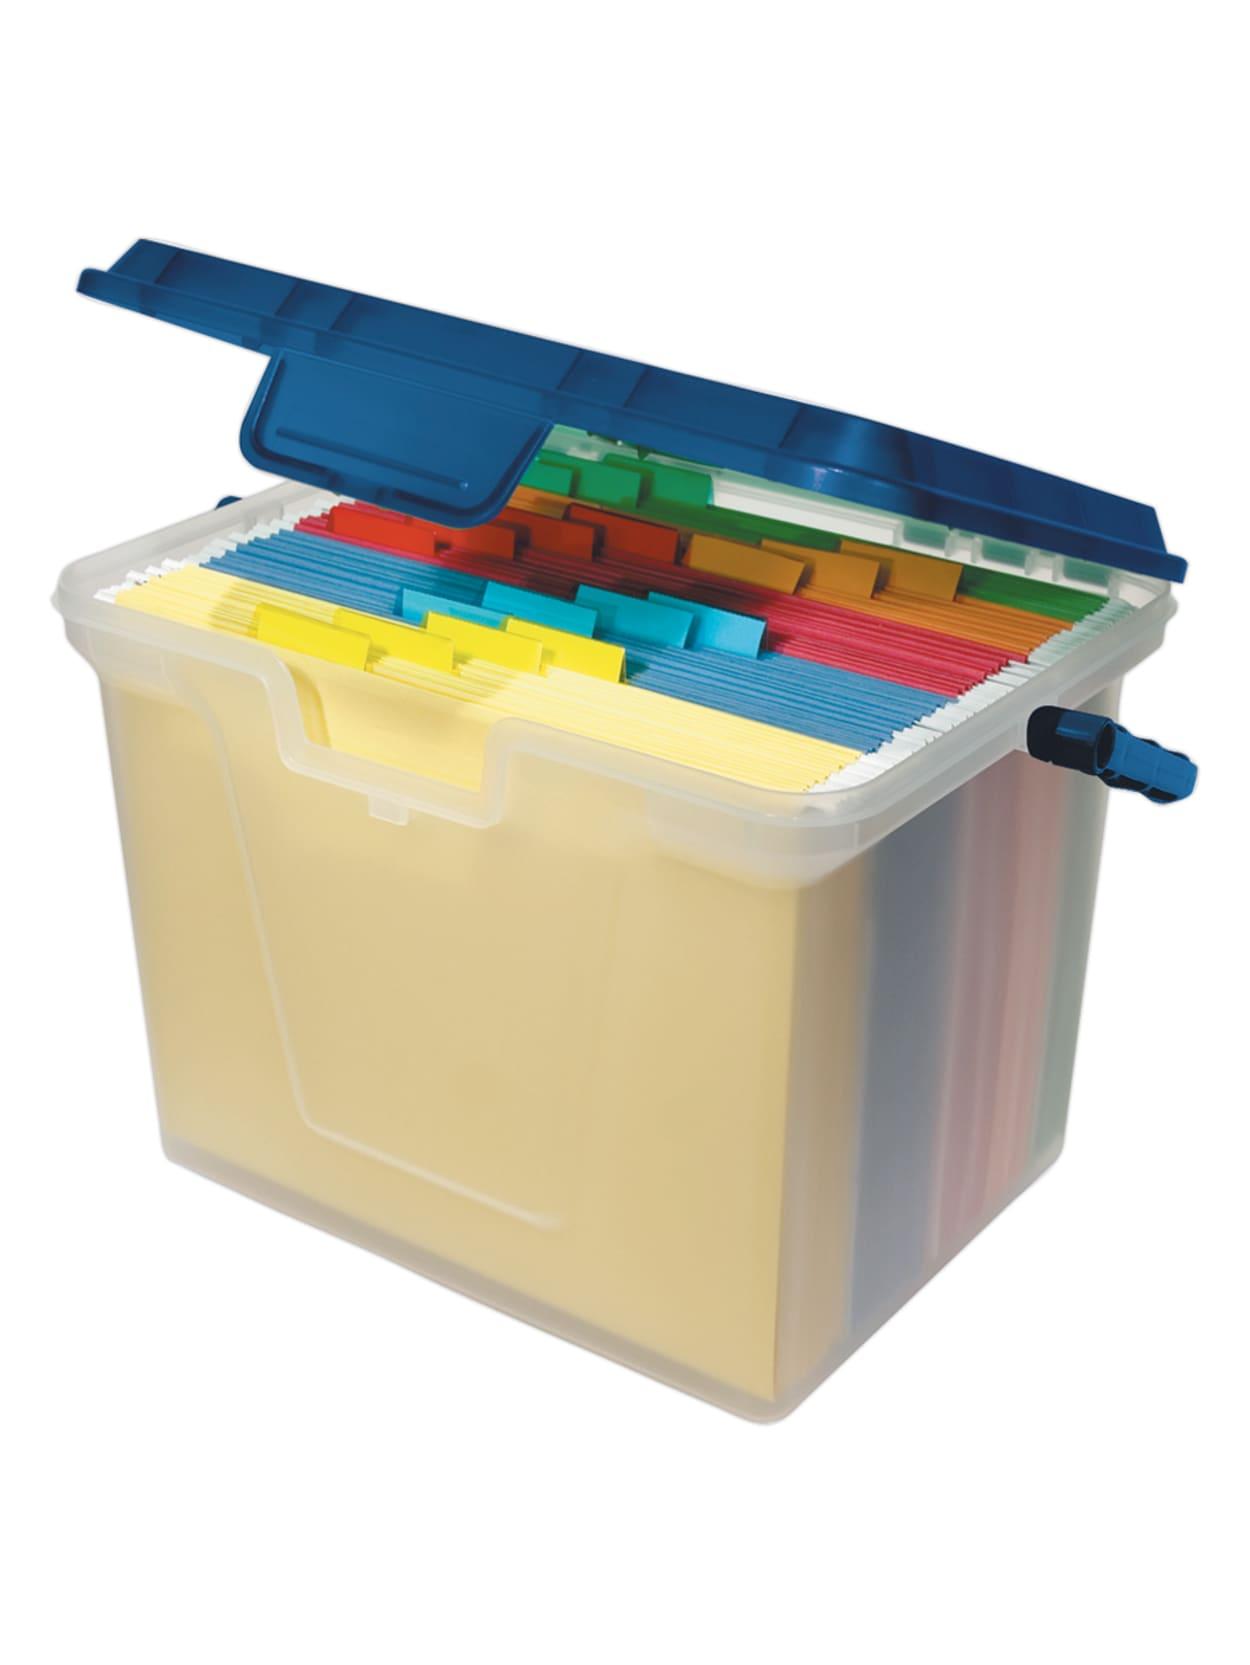 Collapsible Folder Organizer File Storage Box White OR Black Holds Hanging Folde